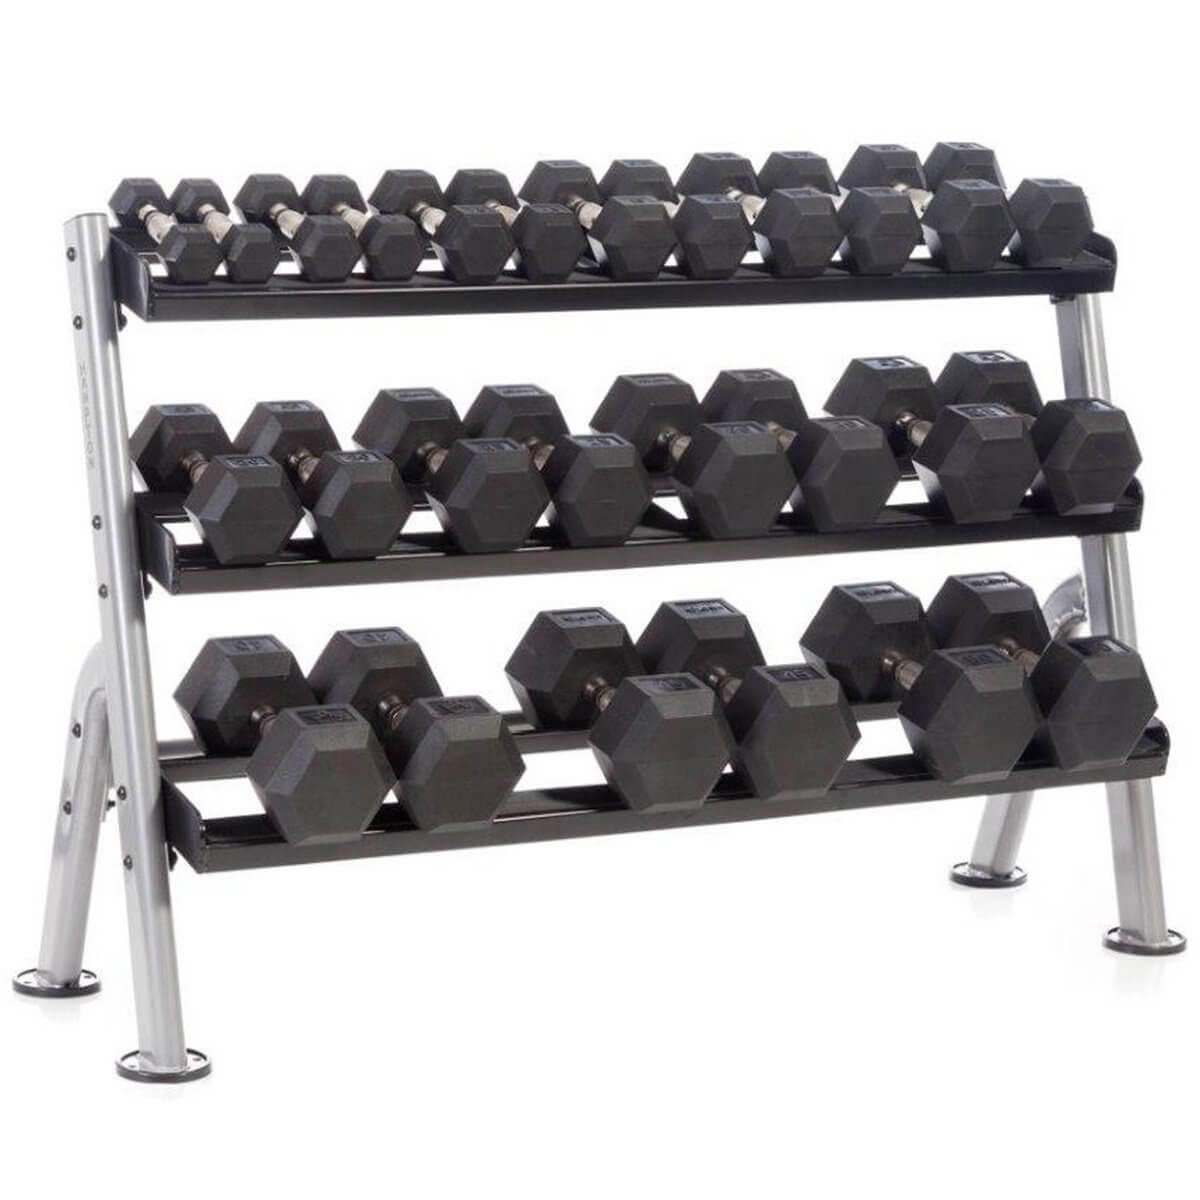 hampton 3 tier 52 horizontal dumbbell rack used gym equipment